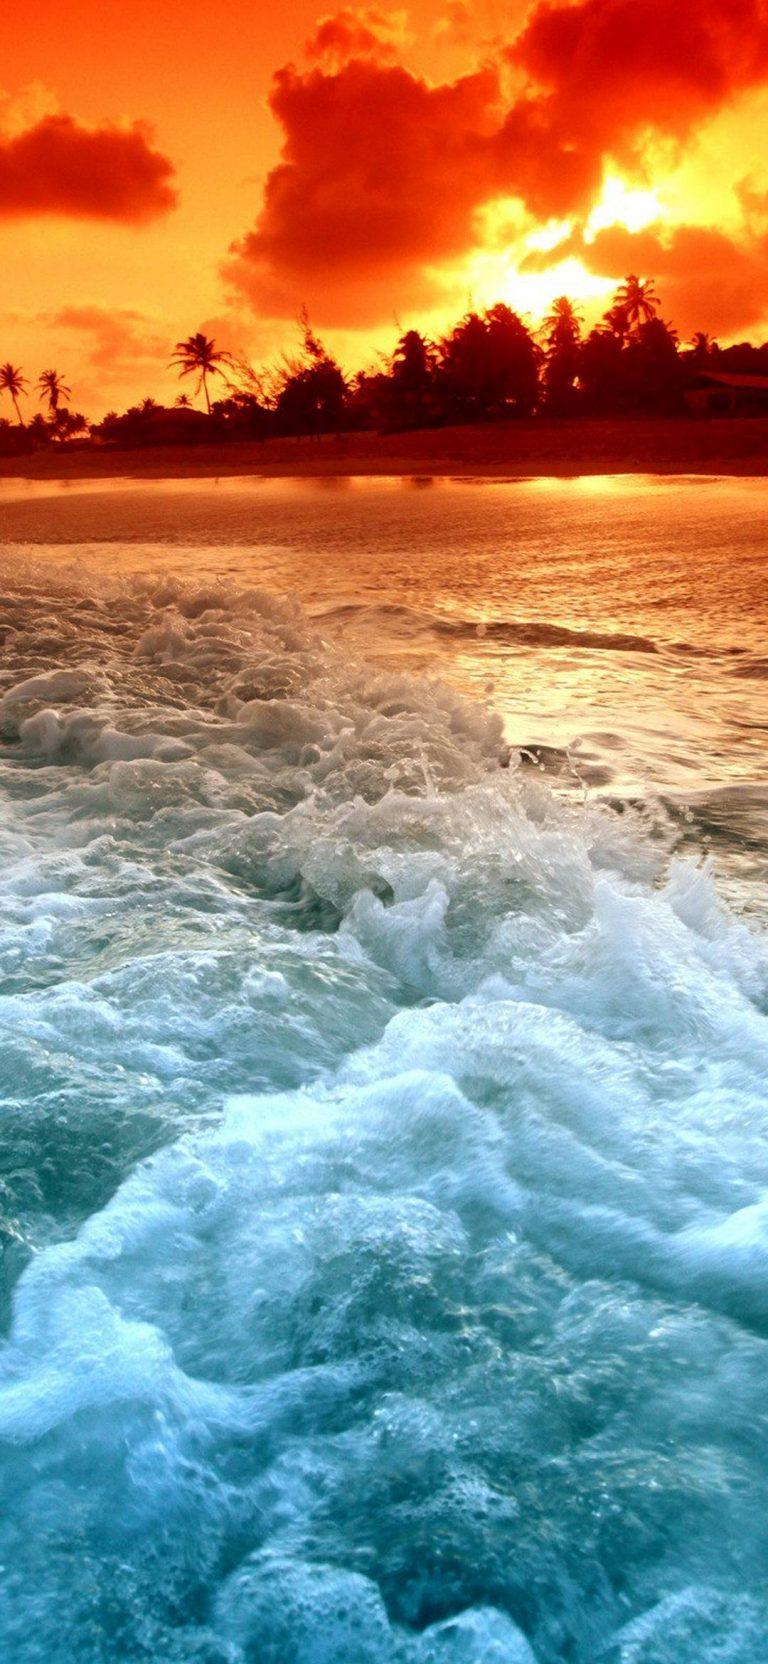 Tropical Beach Sunset 1080x2340 768x1664